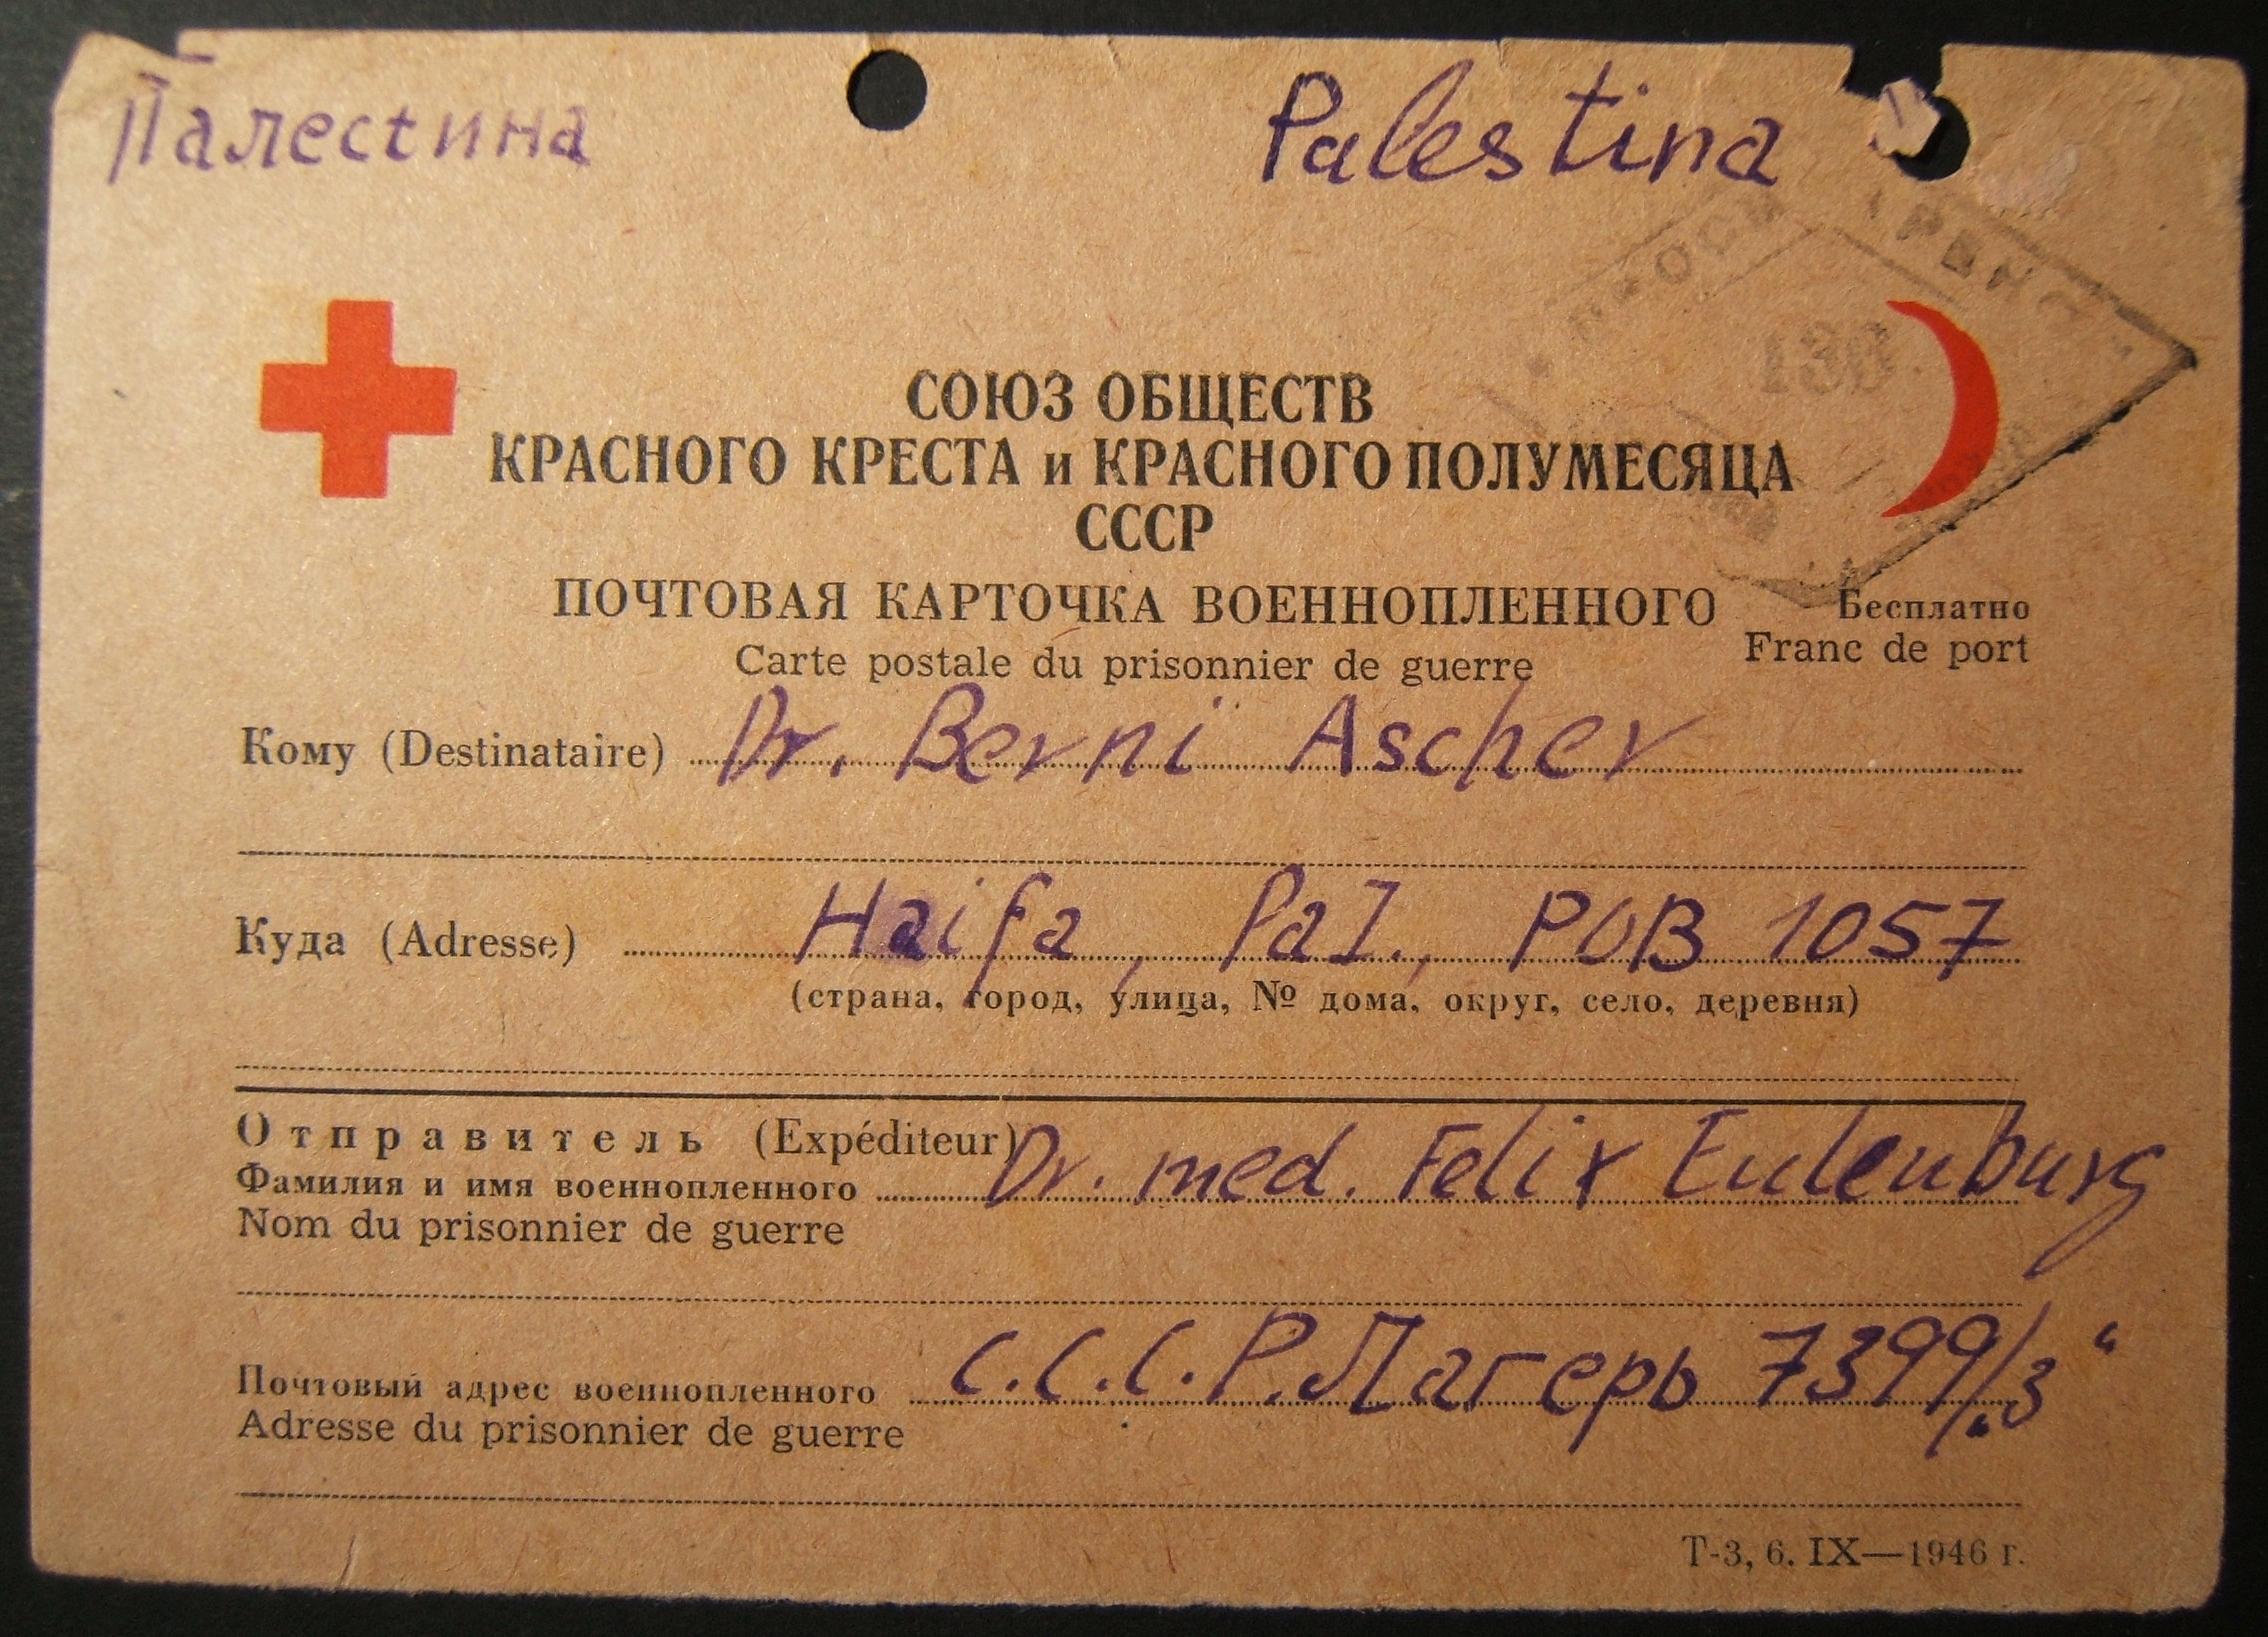 2/1947 postwar WWII Soviet Red Cross POW mail from AHUM to Berni Ascher in HAIFA